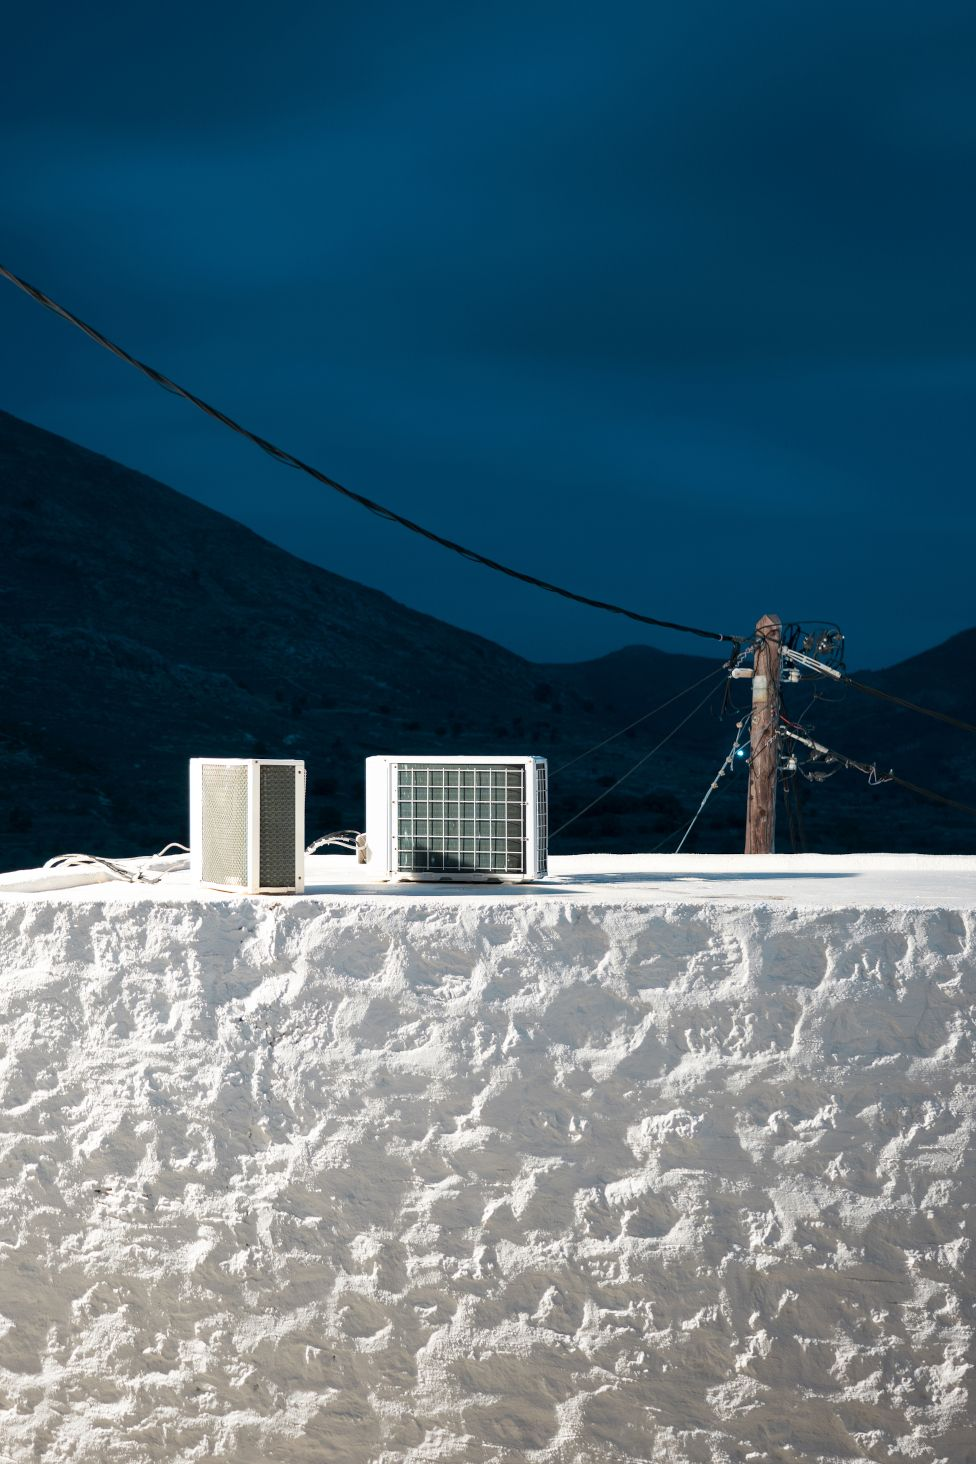 Титул «Фотограф года встуденческом конкурсе» вэтом году присужден греческой студентке Иоанне Сакеллараки / Ioanna Sakellaraki заее цикл «Эйфория» / Aeiforia.